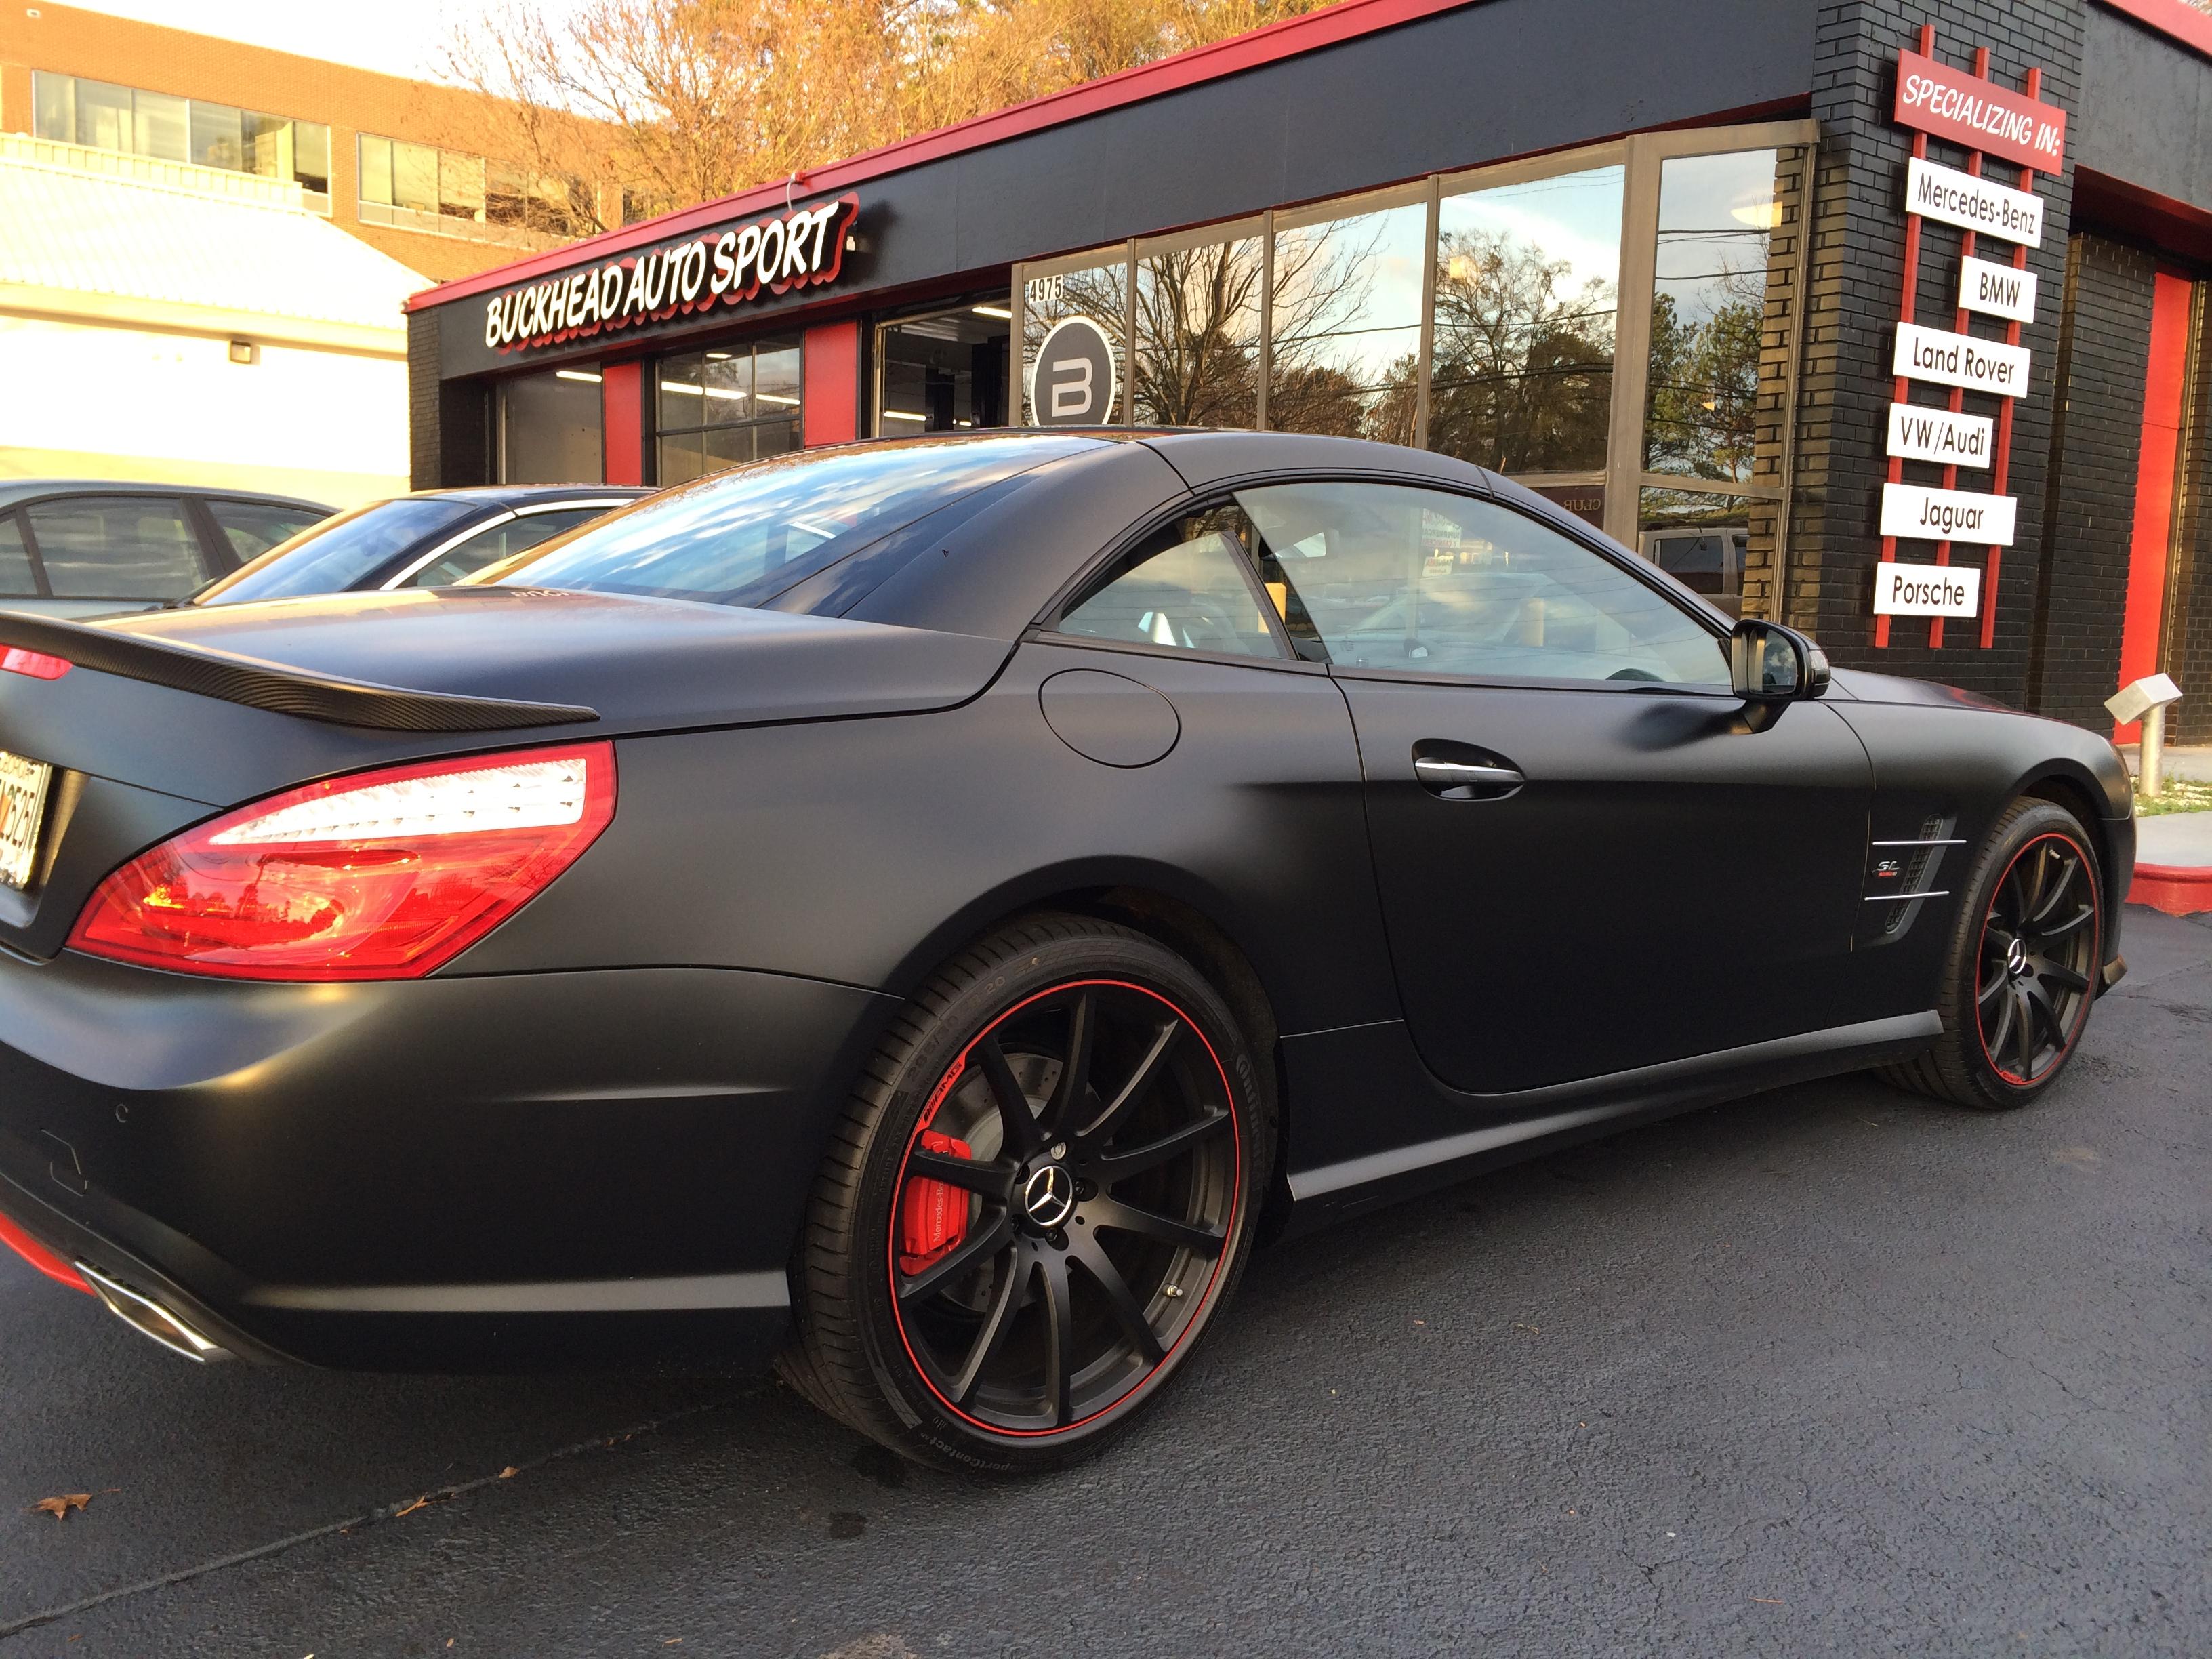 Stephen adams buckhead auto sport atlanta ga for Mercedes benz buckhead service